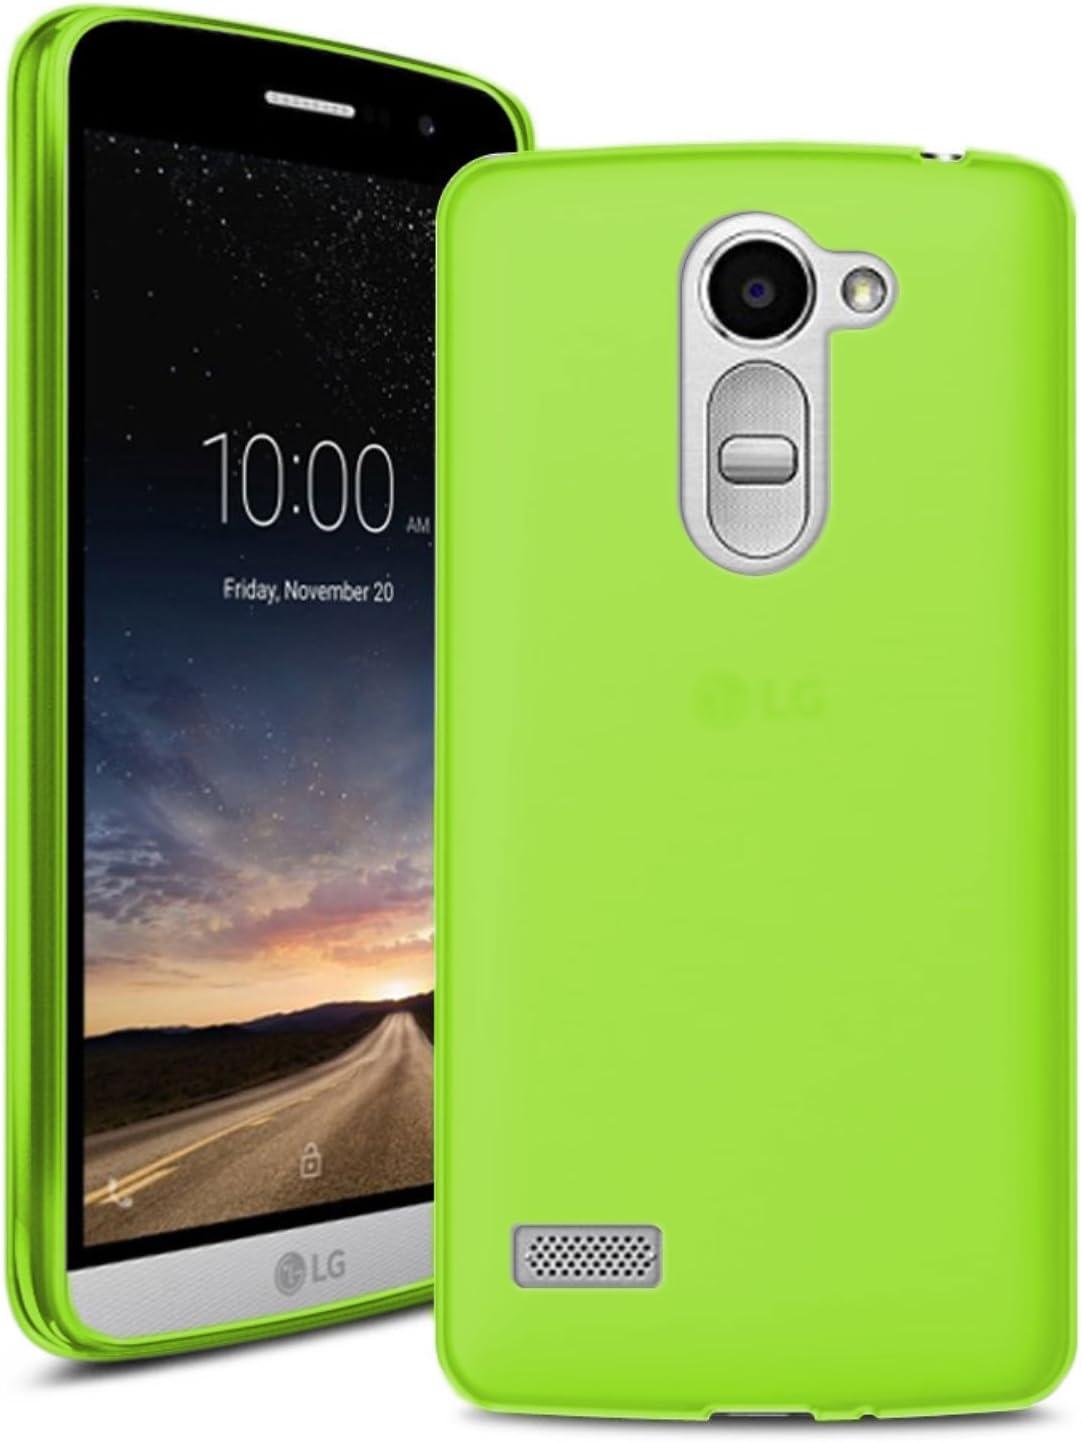 TBOC® Funda de Gel TPU Verde para LG Ray X190: Amazon.es: Electrónica